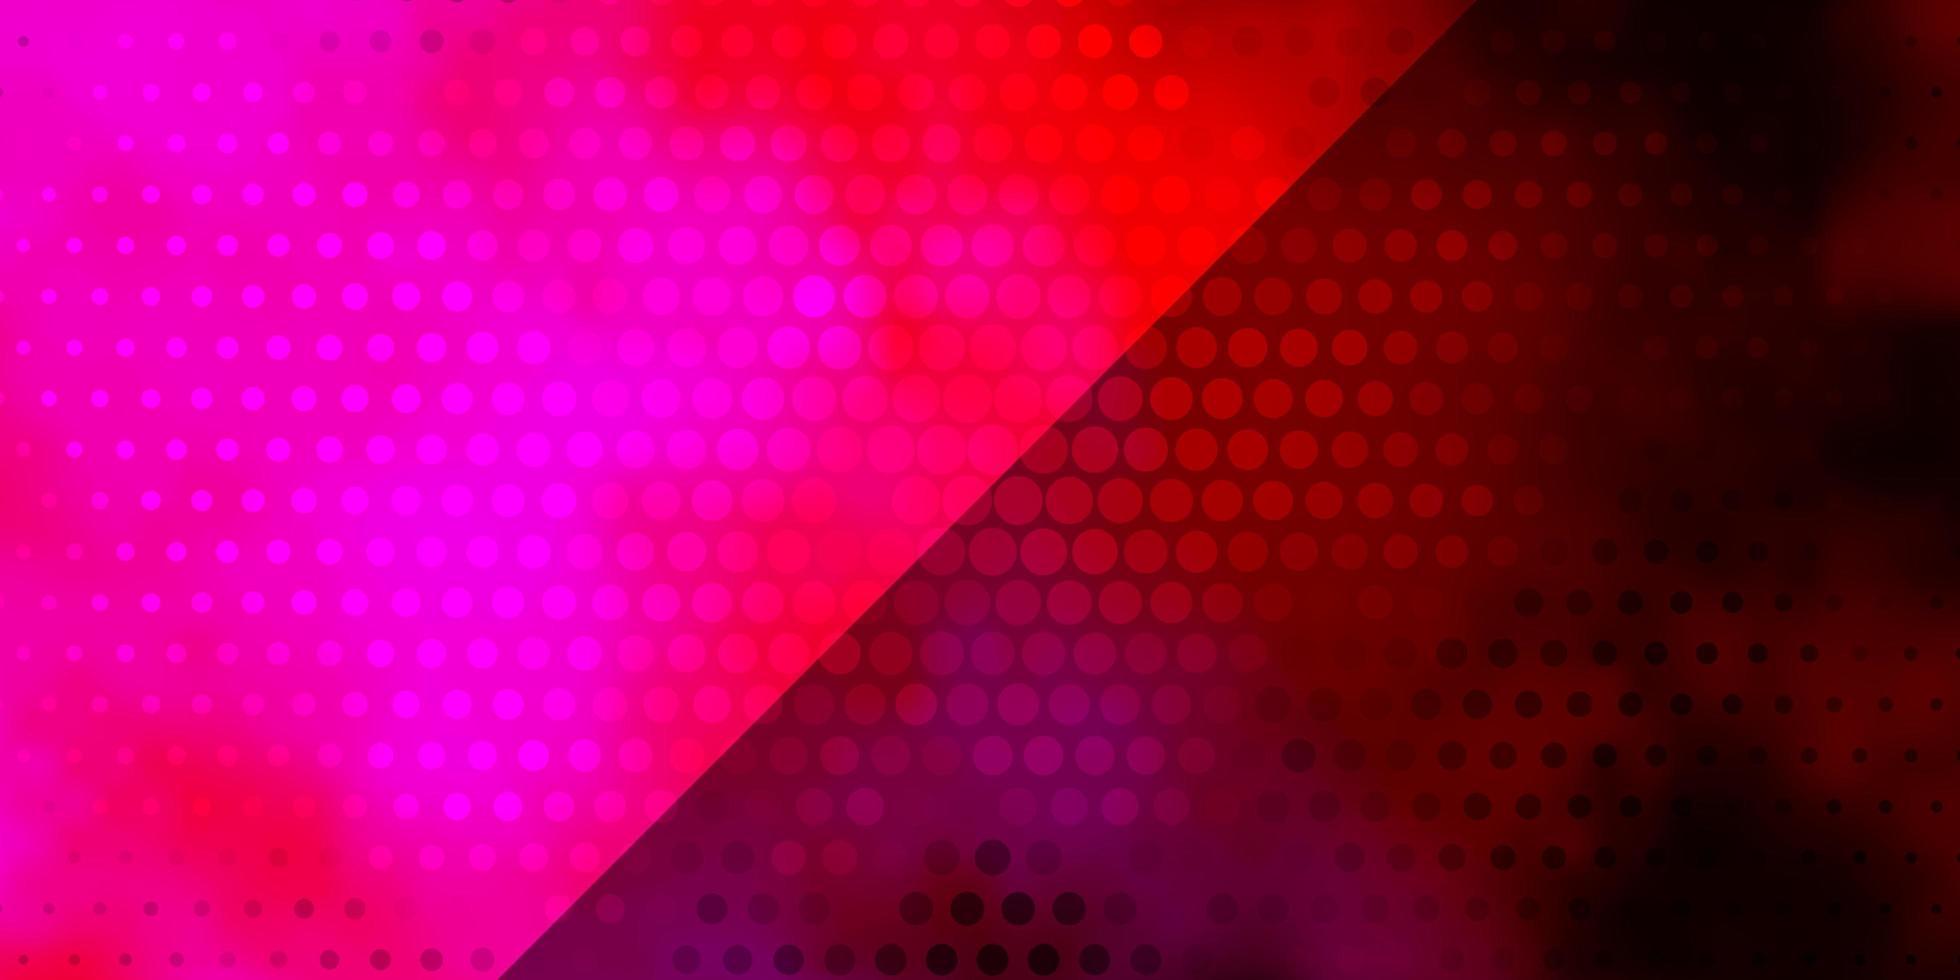 dunkelvioletter, rosa Vektorhintergrund mit Kreisen vektor